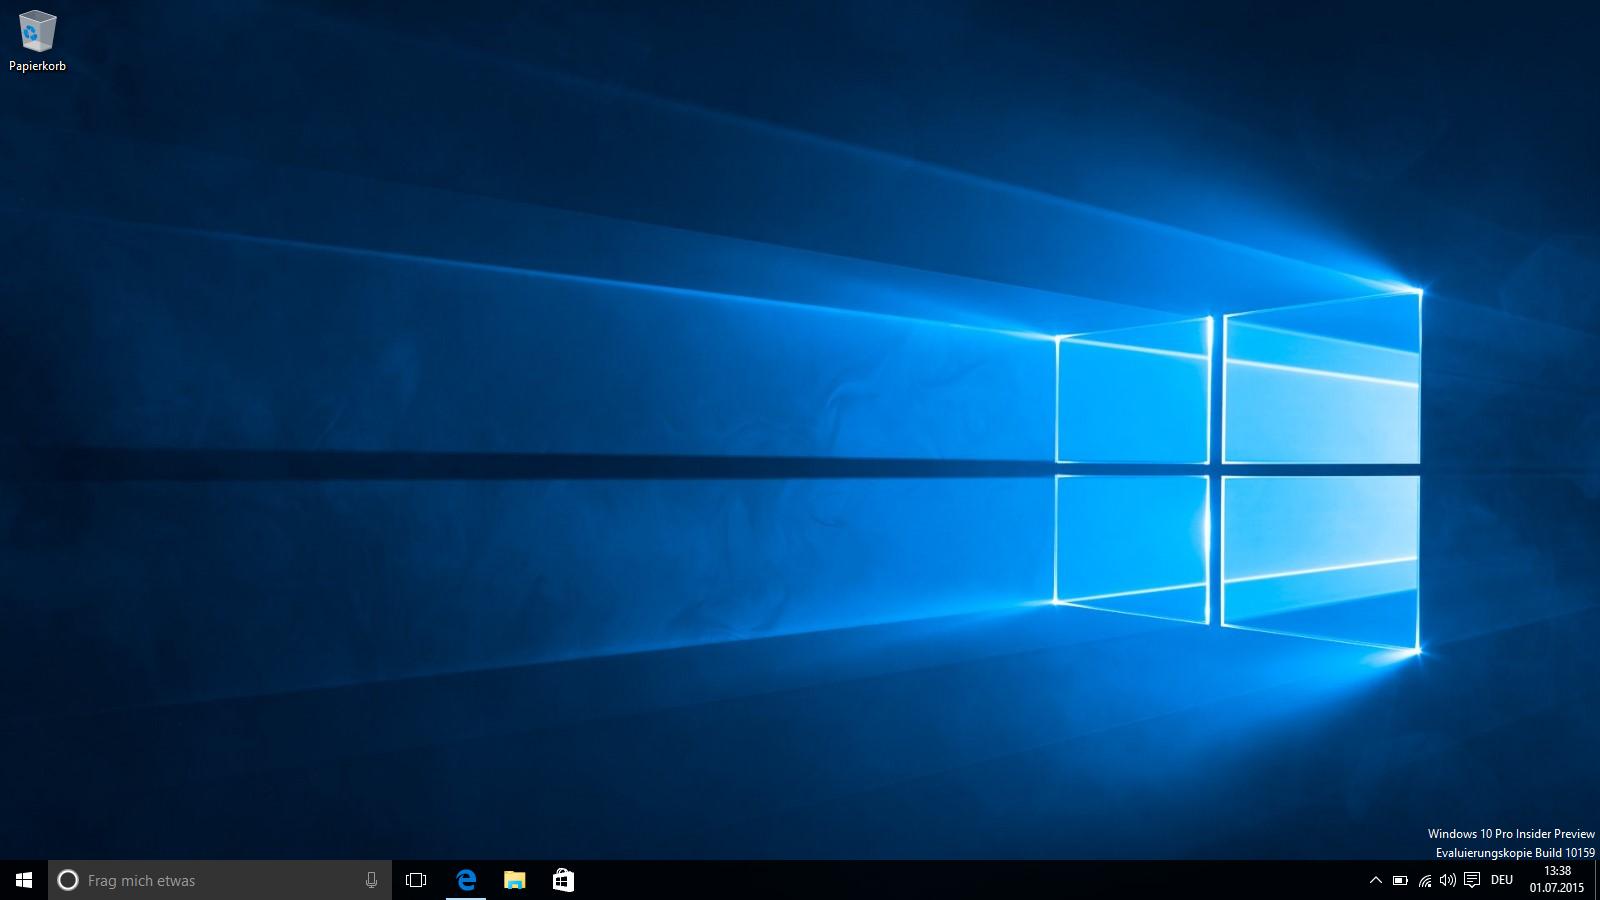 Windows 10 Build 10159 Screenshot